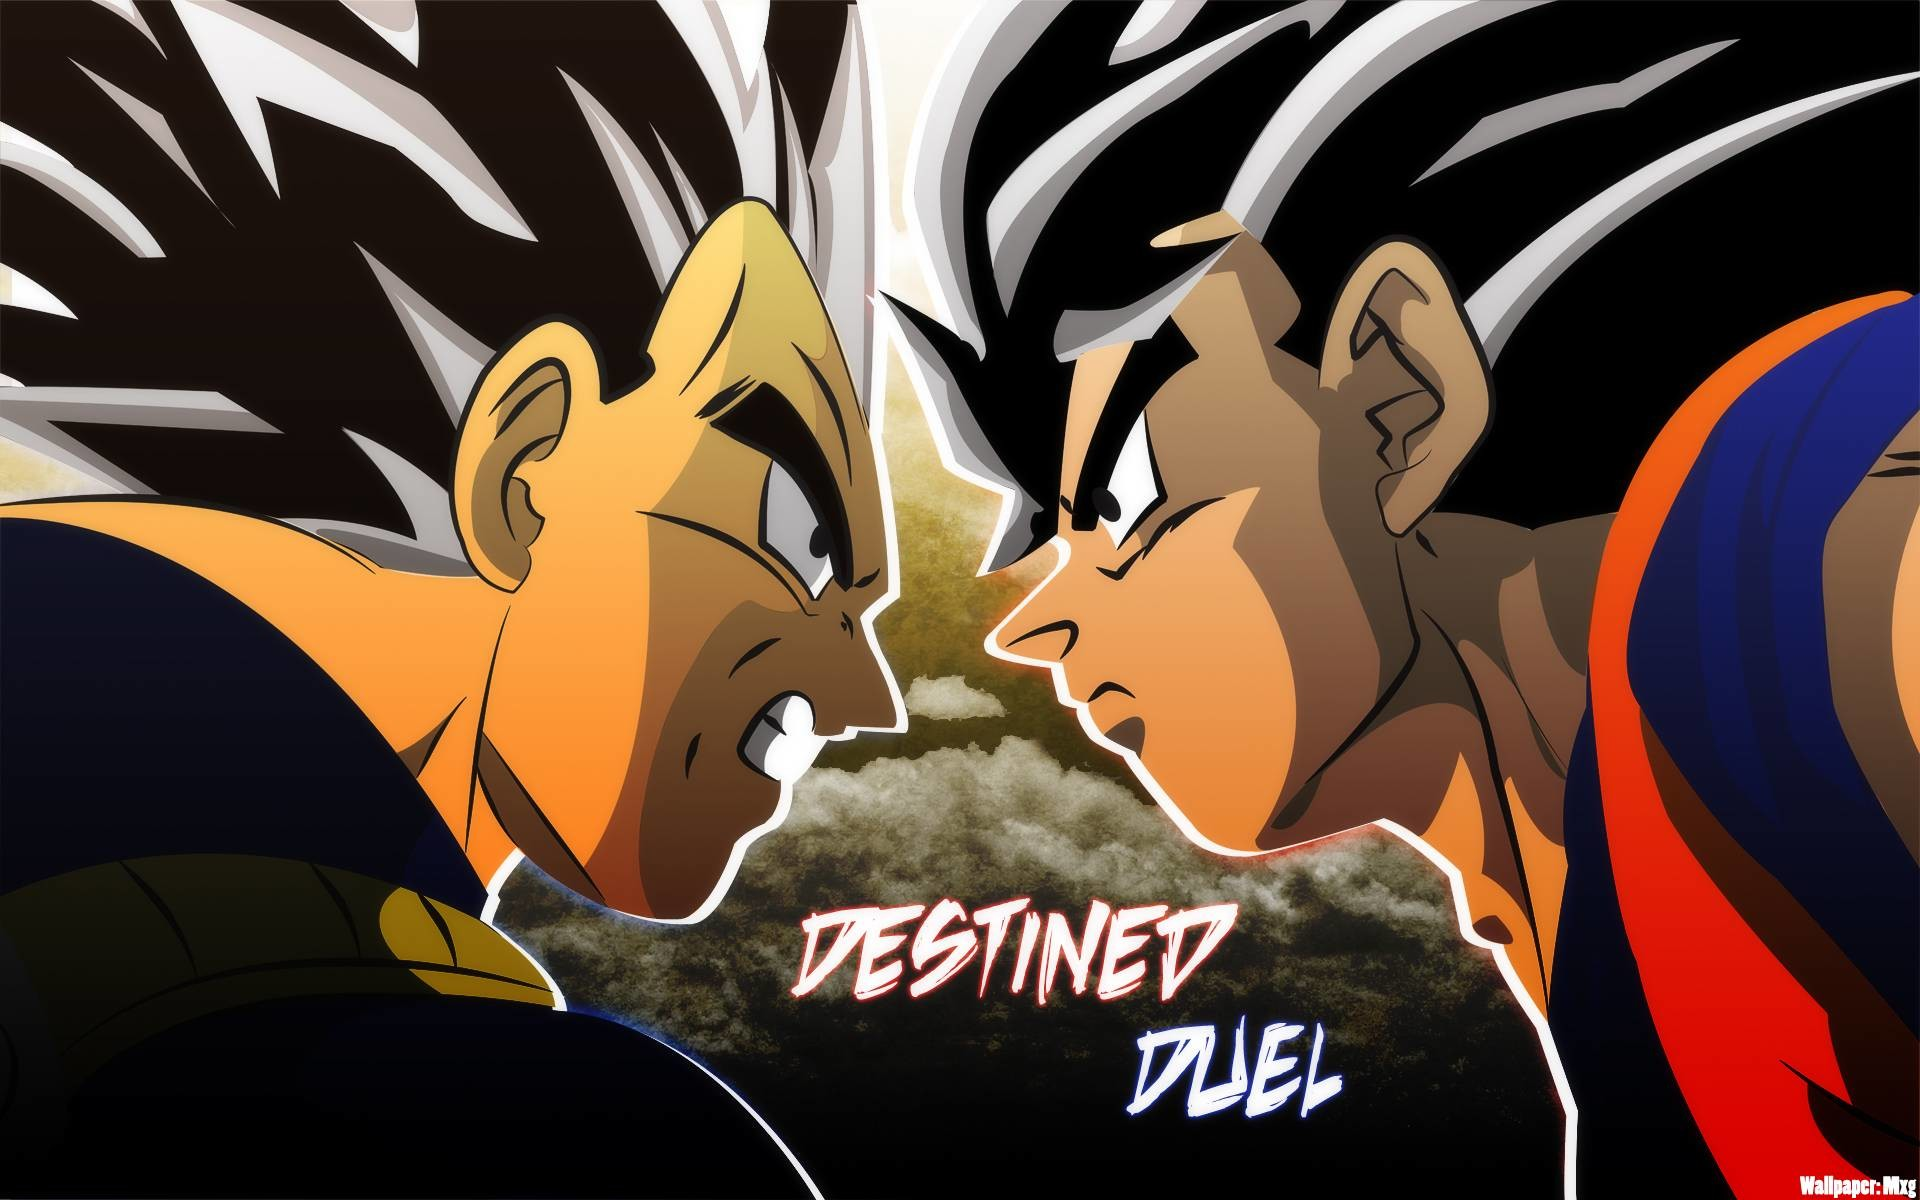 Goku vs Vegeta Wallpaper – Dragon Ball Z Wallpaper (35965661) – Fanpop